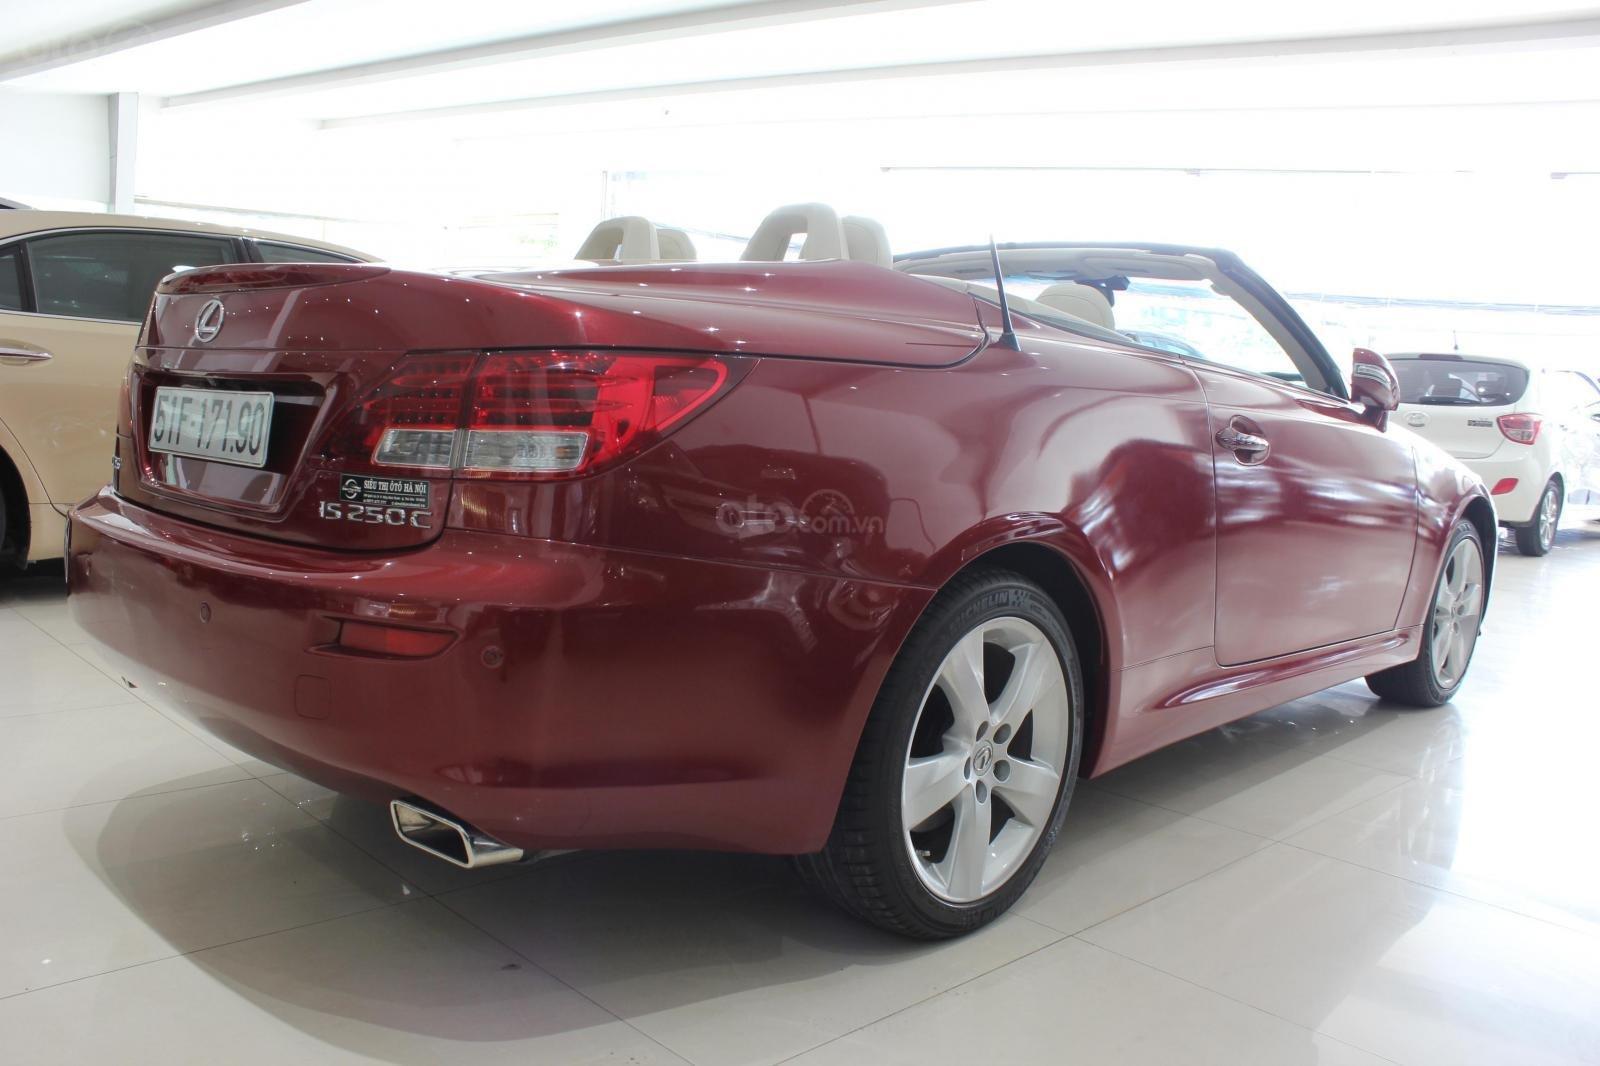 Bán Lexus IS 250 sx 2010, màu đỏ, xe nhập (4)